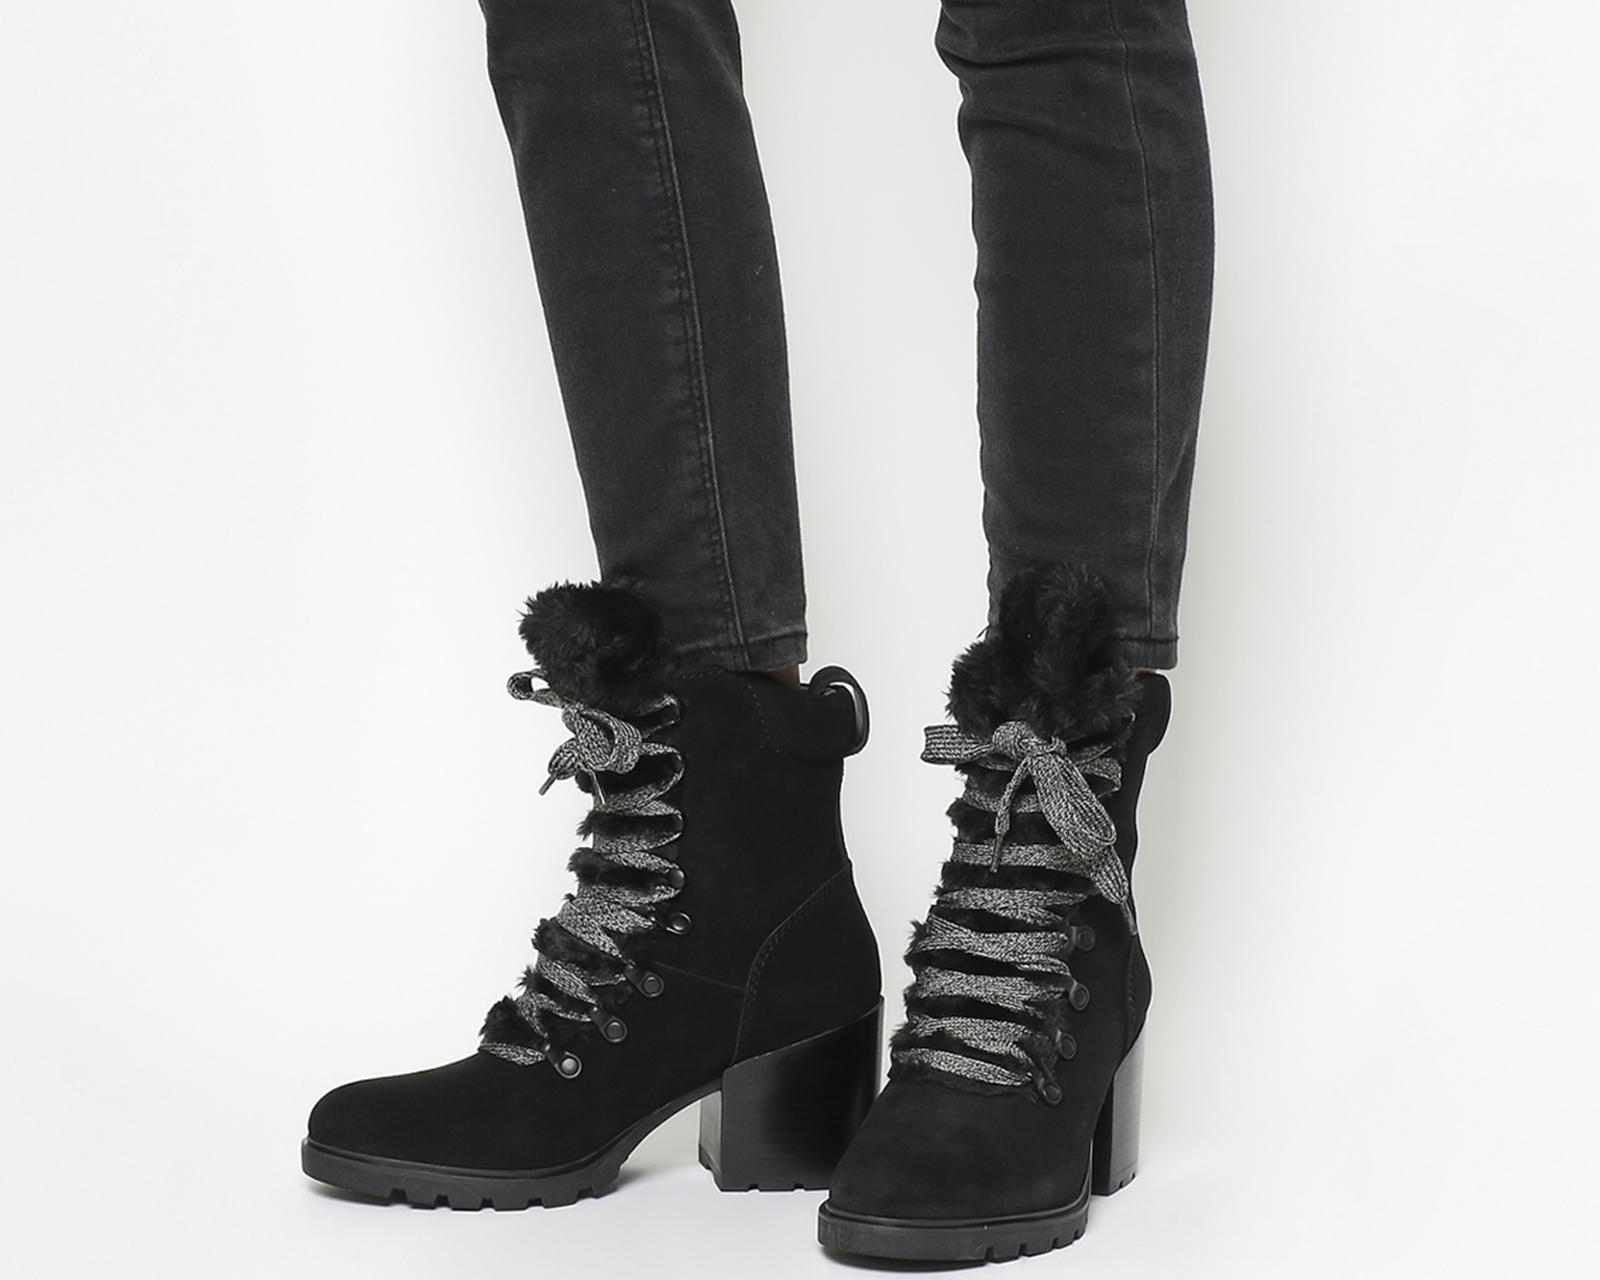 da8f45aa6 Womens Kendall - Kylie Spencer Hiker Black Suede Boots